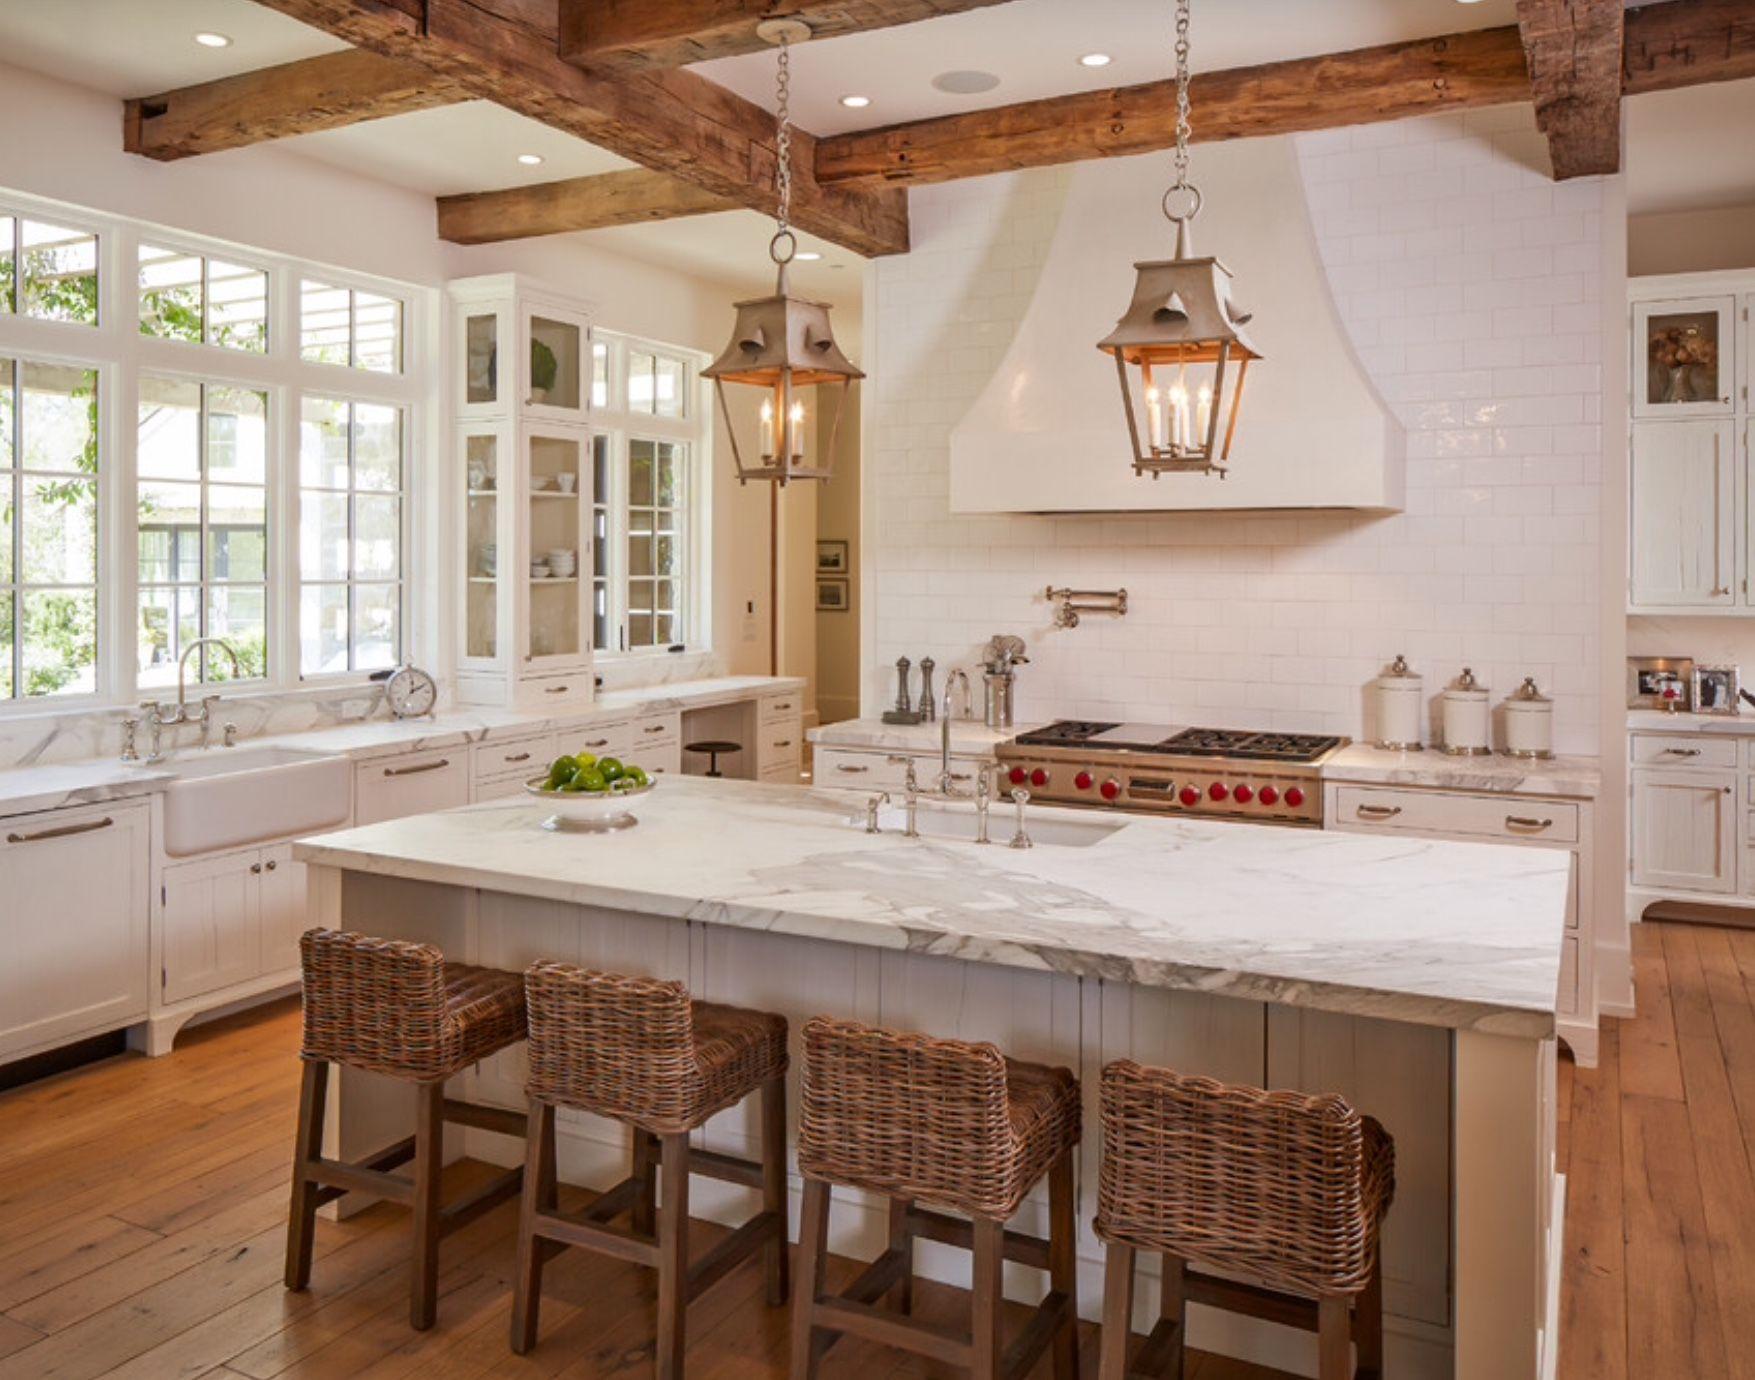 Everythingcabinets hood marble granite farmer sink house